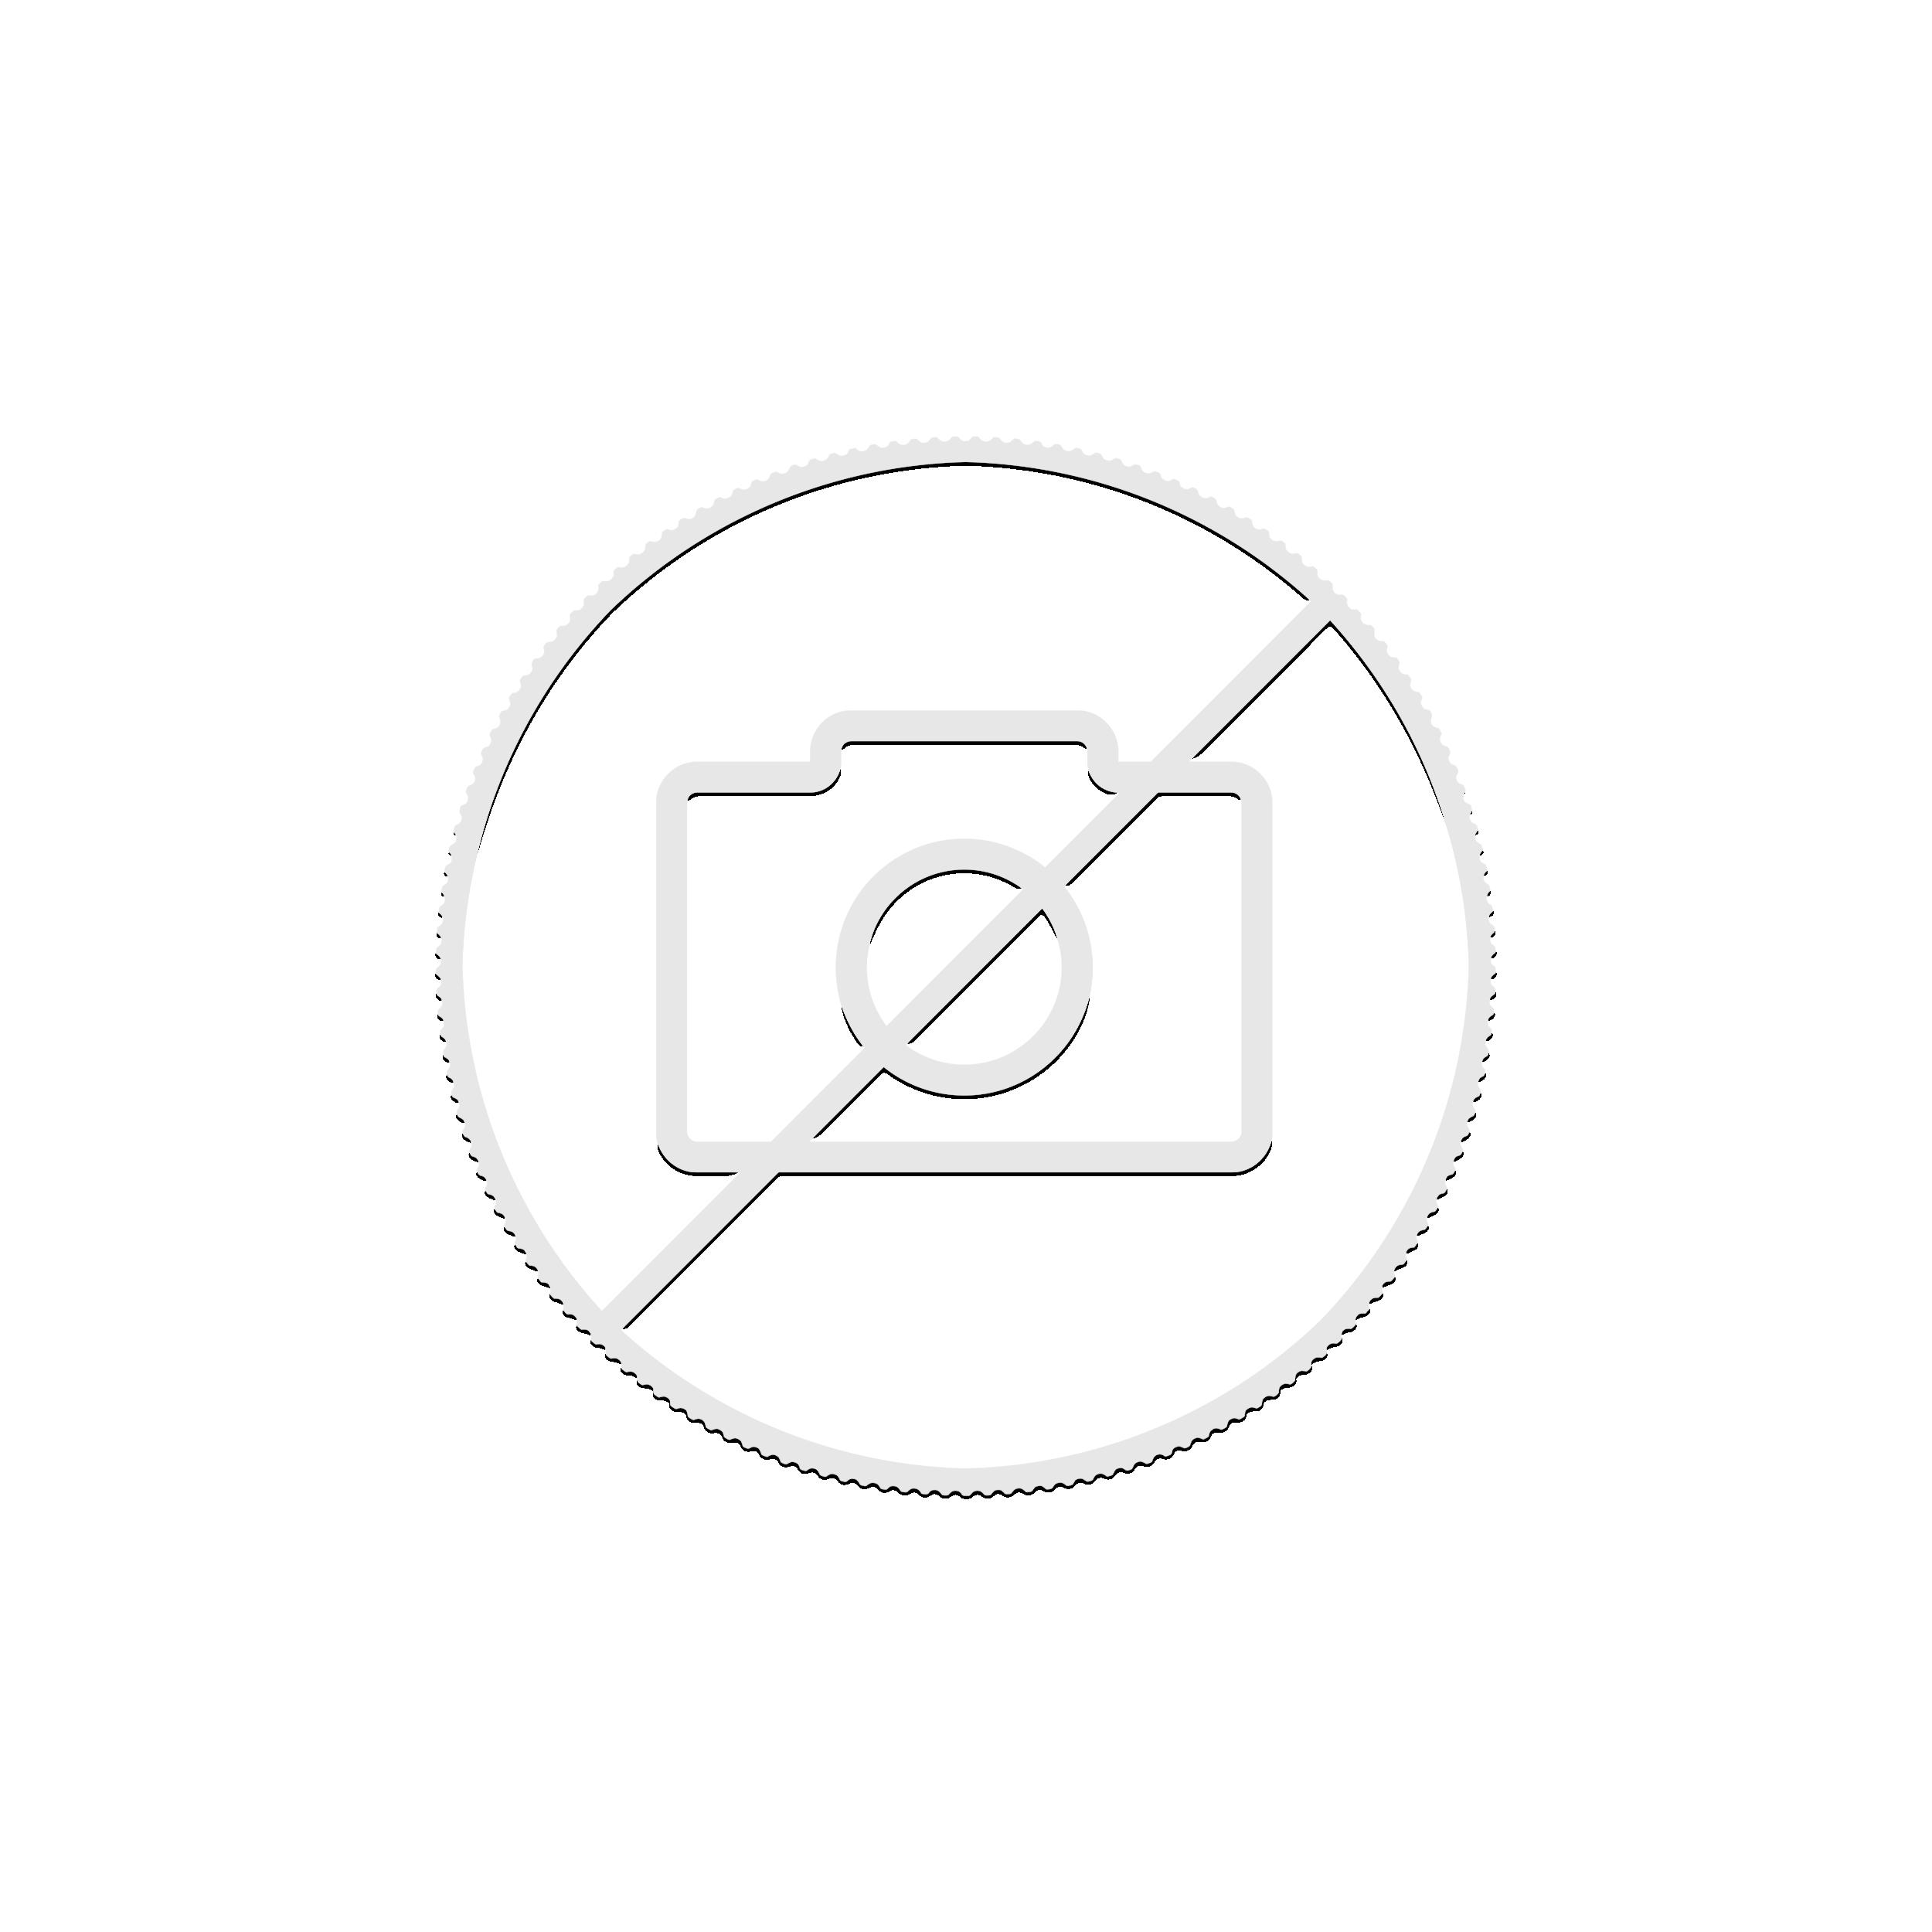 1 Troy ounce zilveren munt Van Gogh De Sterrennacht 2020